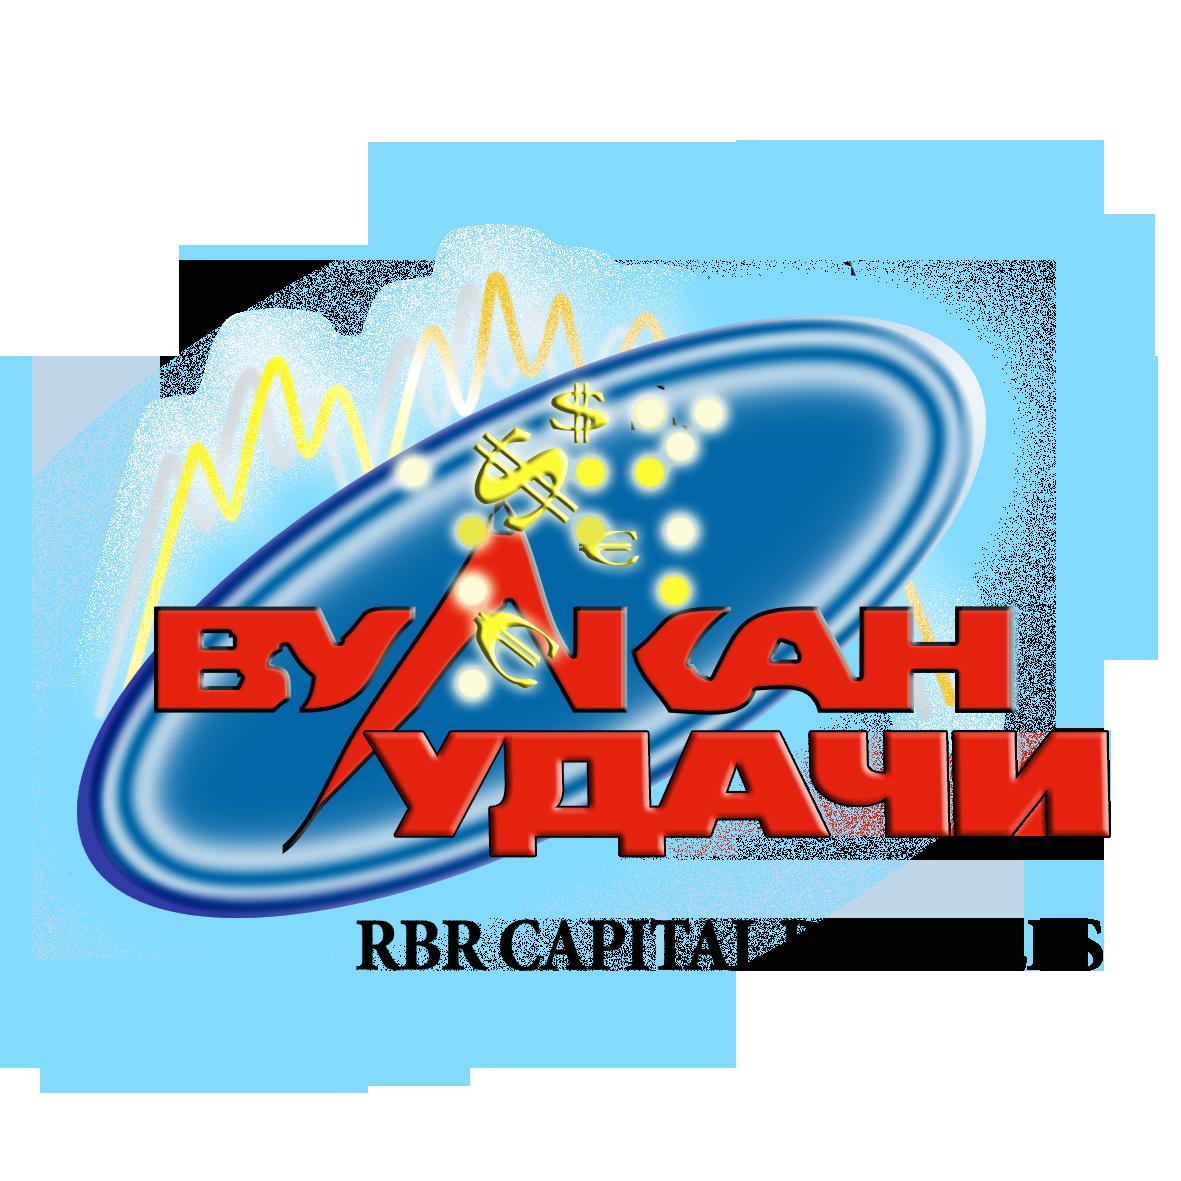 Разработка логотипа для брокерской компании ВУЛКАН УДАЧИ фото f_59051a236a4f40fc.png